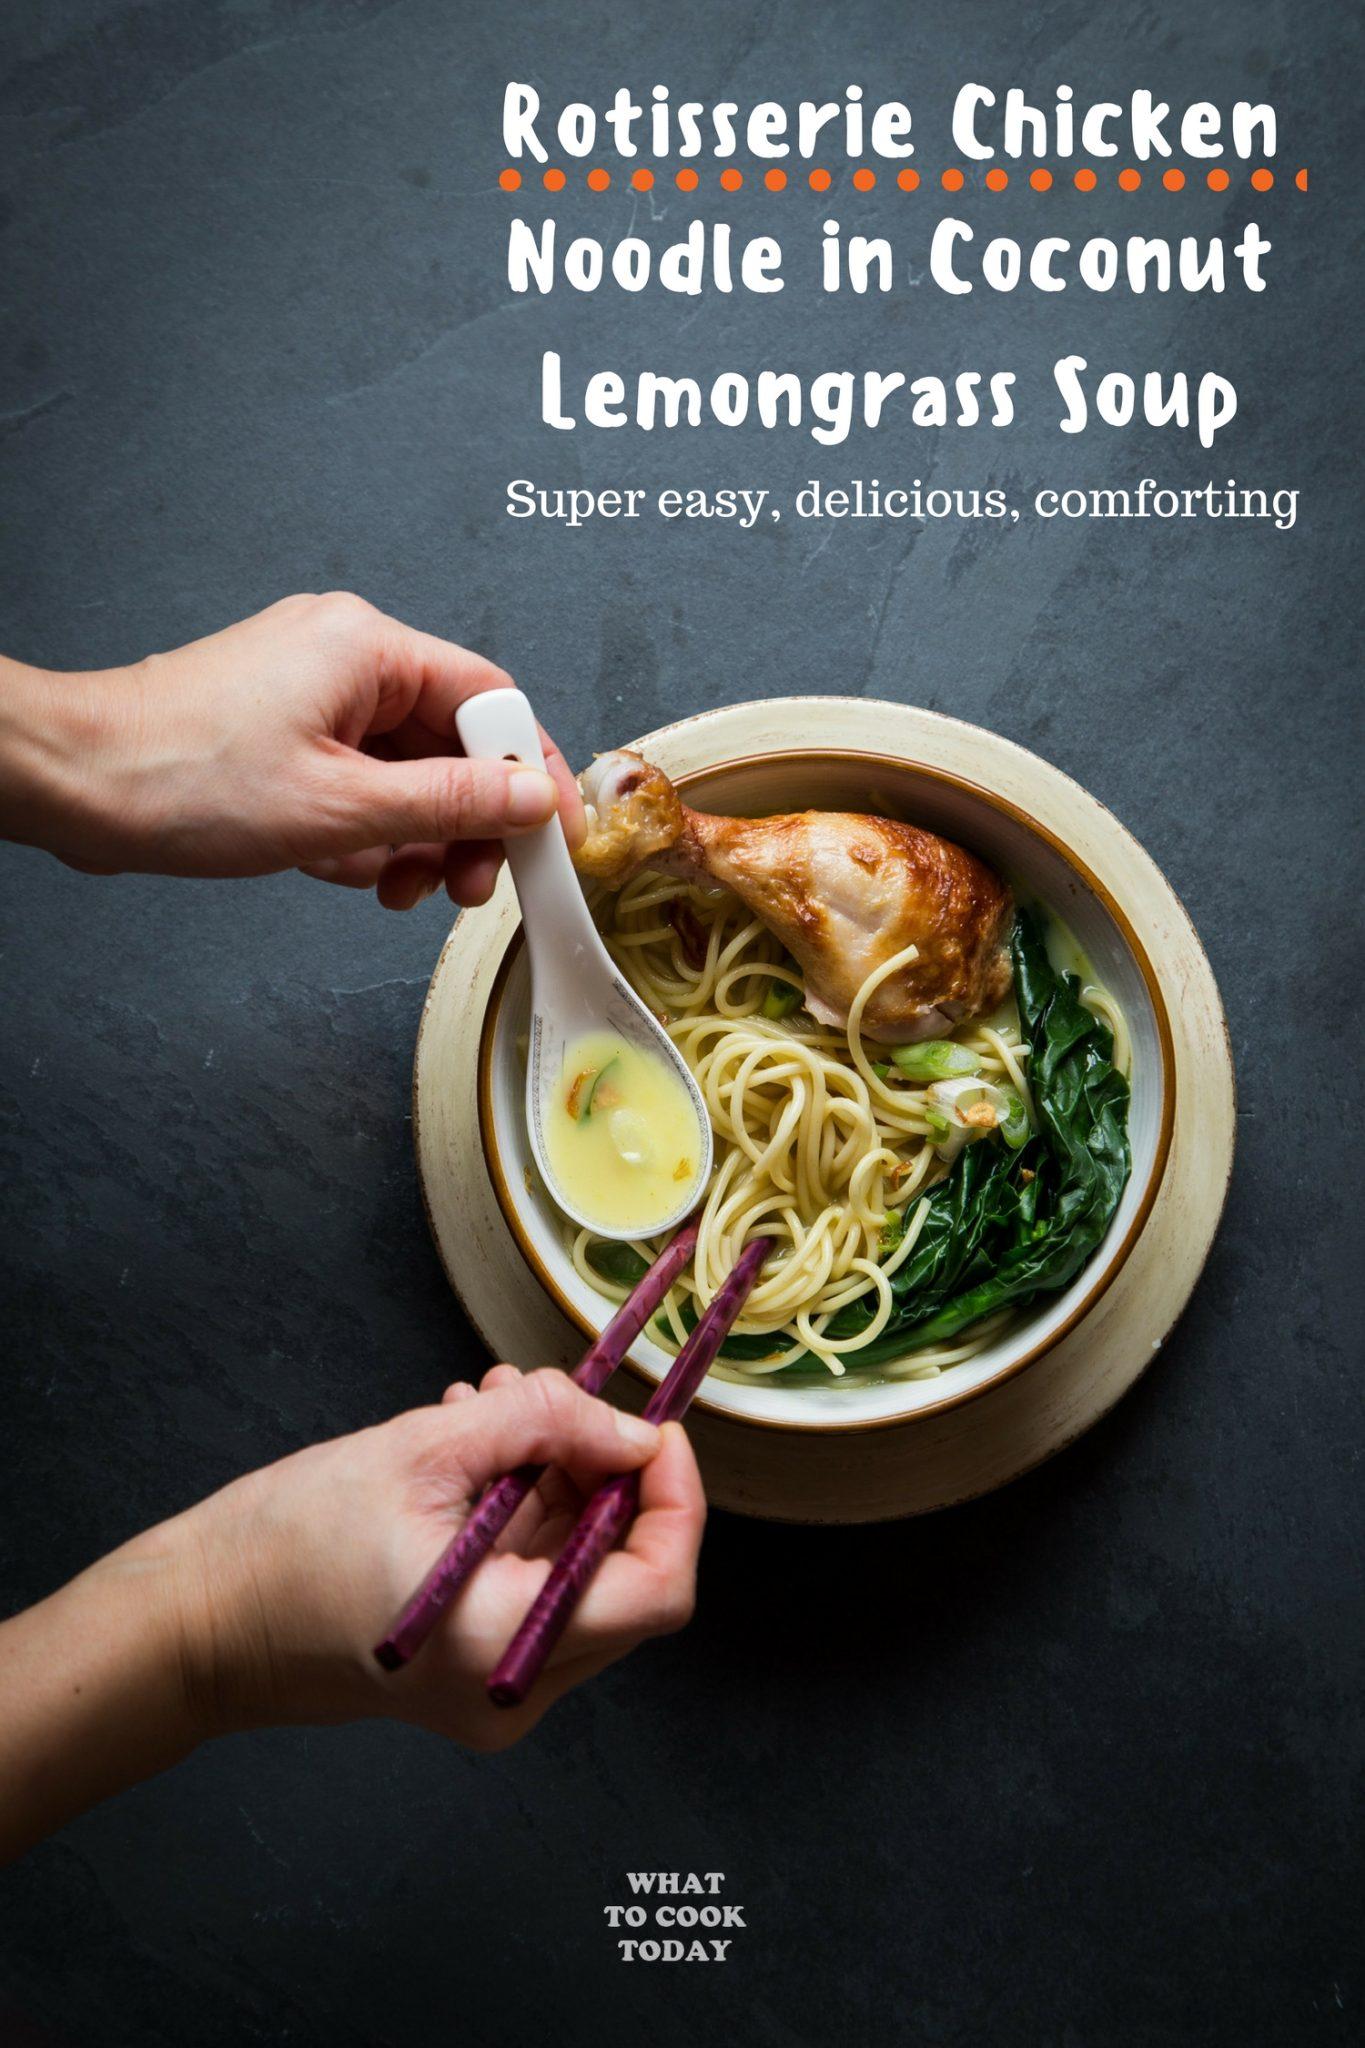 Speedy Rotisserie Chicken Noodle in Coconut Lemongrass Soup #rotisseriechicken #noodlesoup #lemongrass #easyrecipe